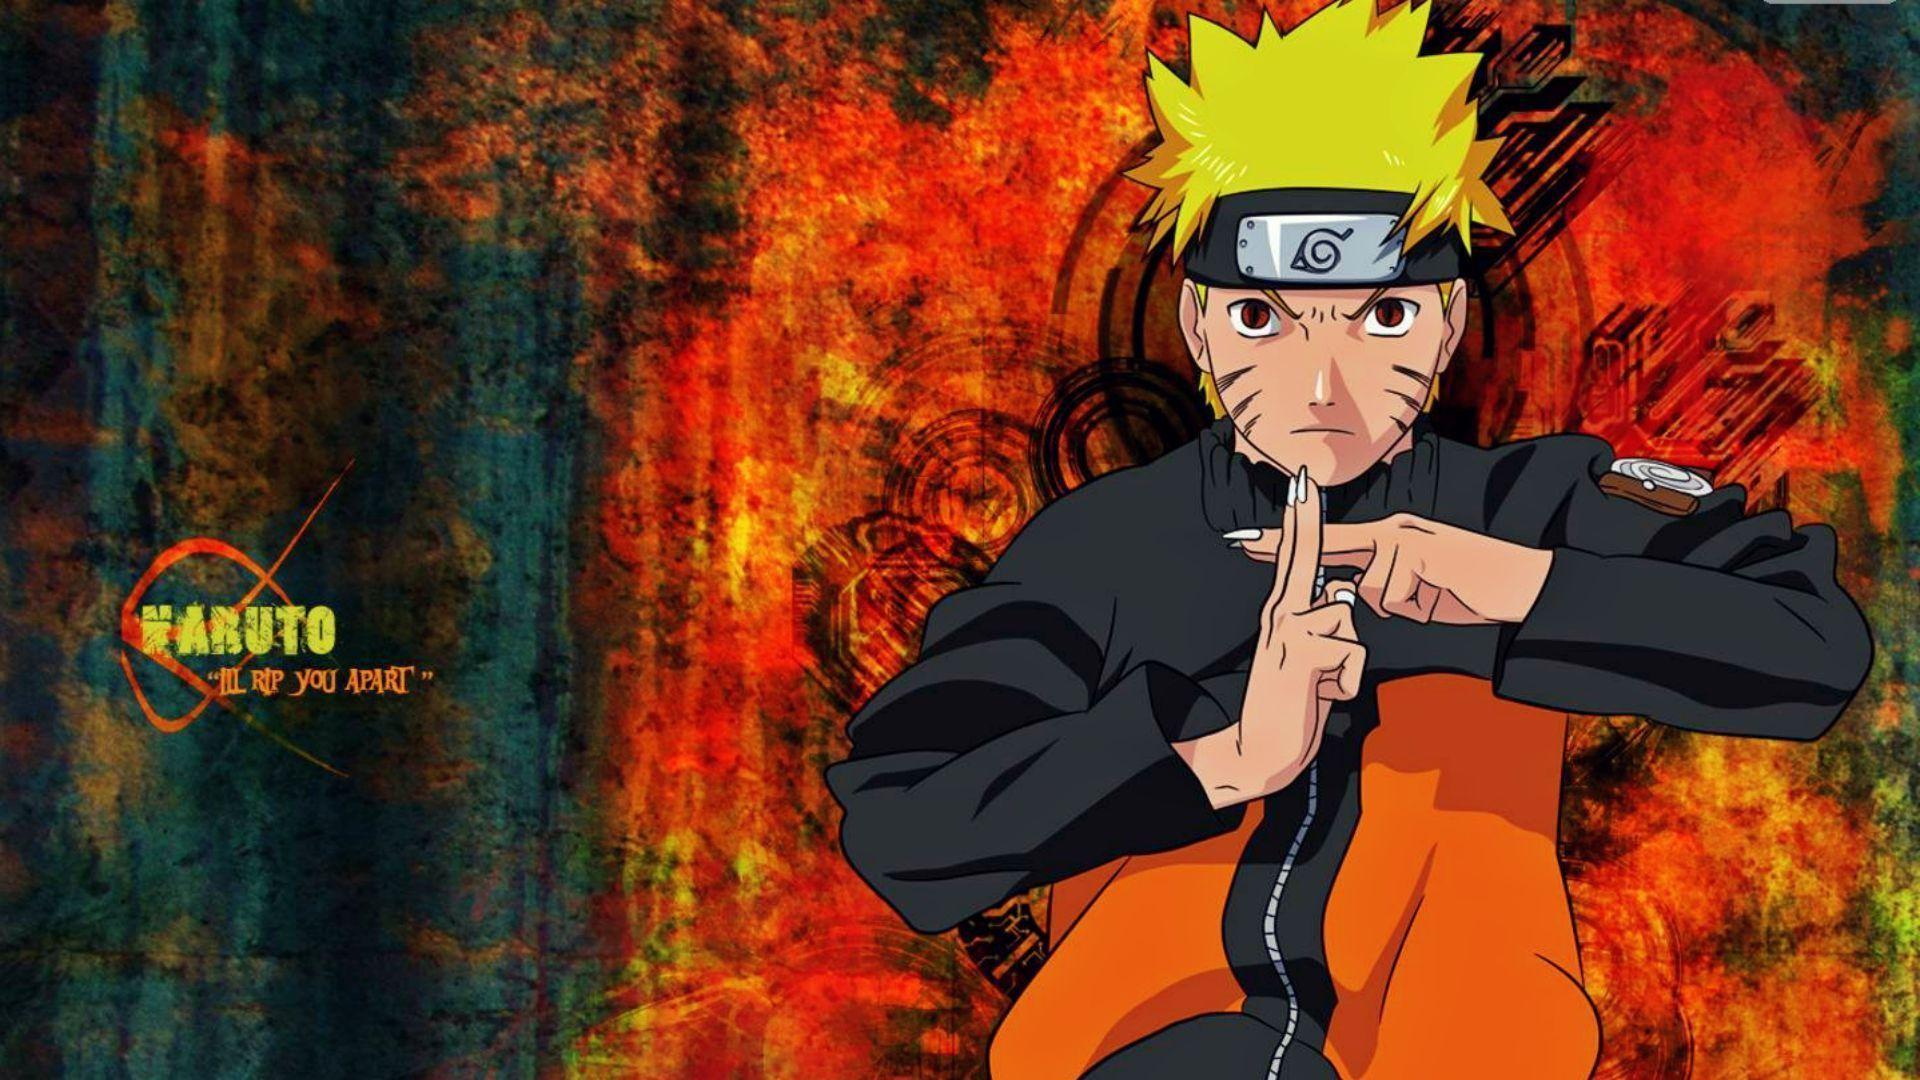 Naruto Wallpapers Hd 1080p Naruto Wallpapers 1080p Wallpaper Cave